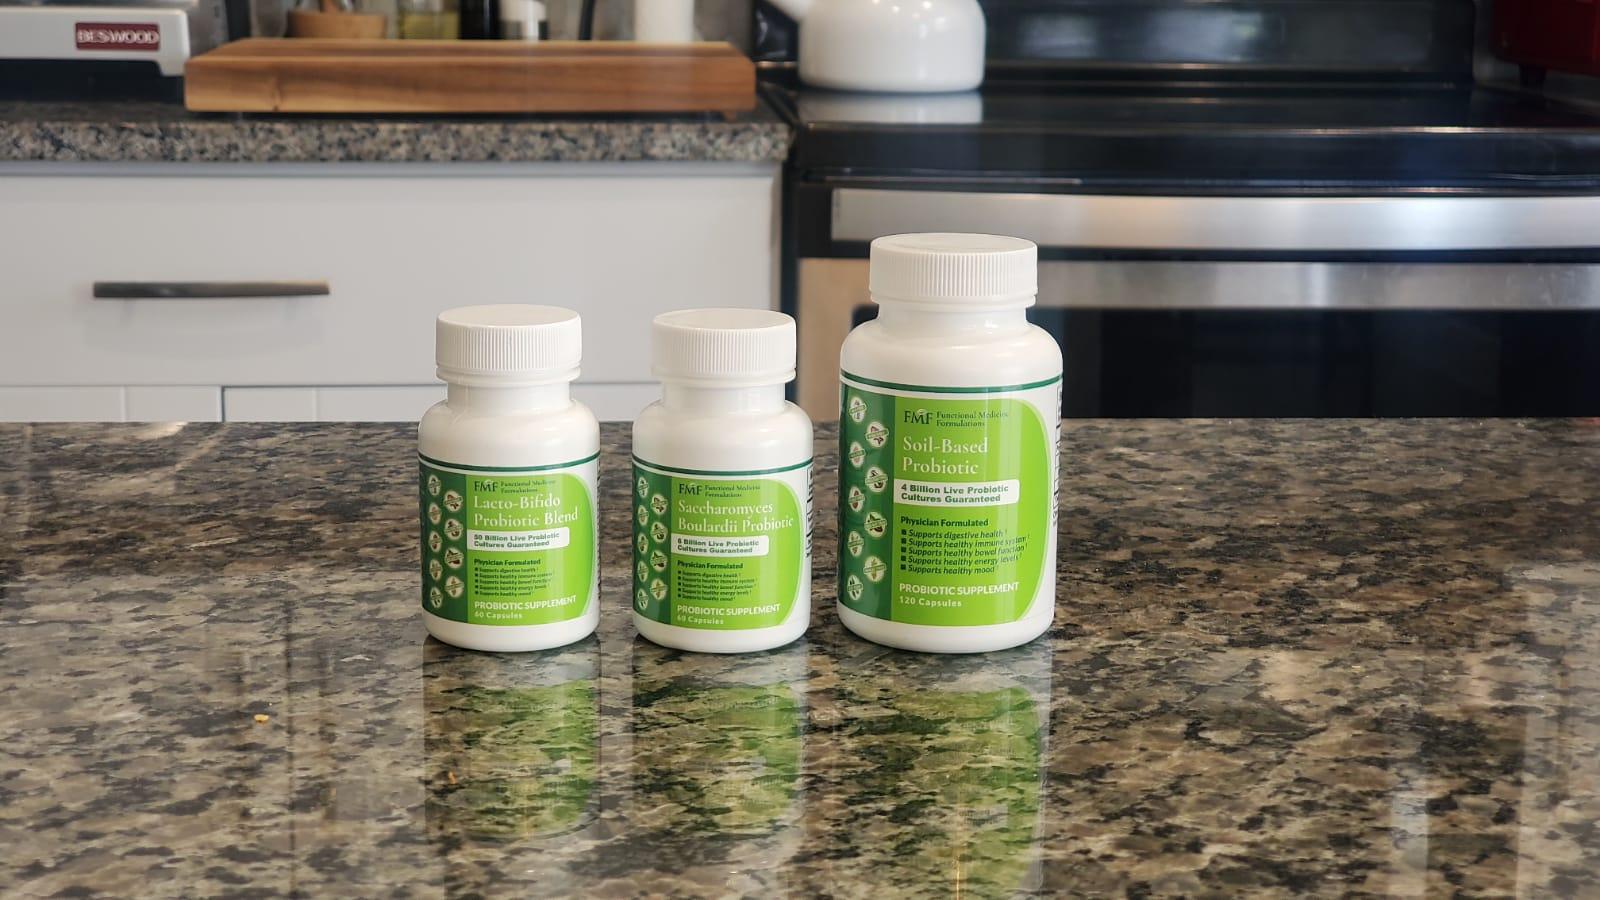 What are probiotics: Three bottles of probiotic supplements